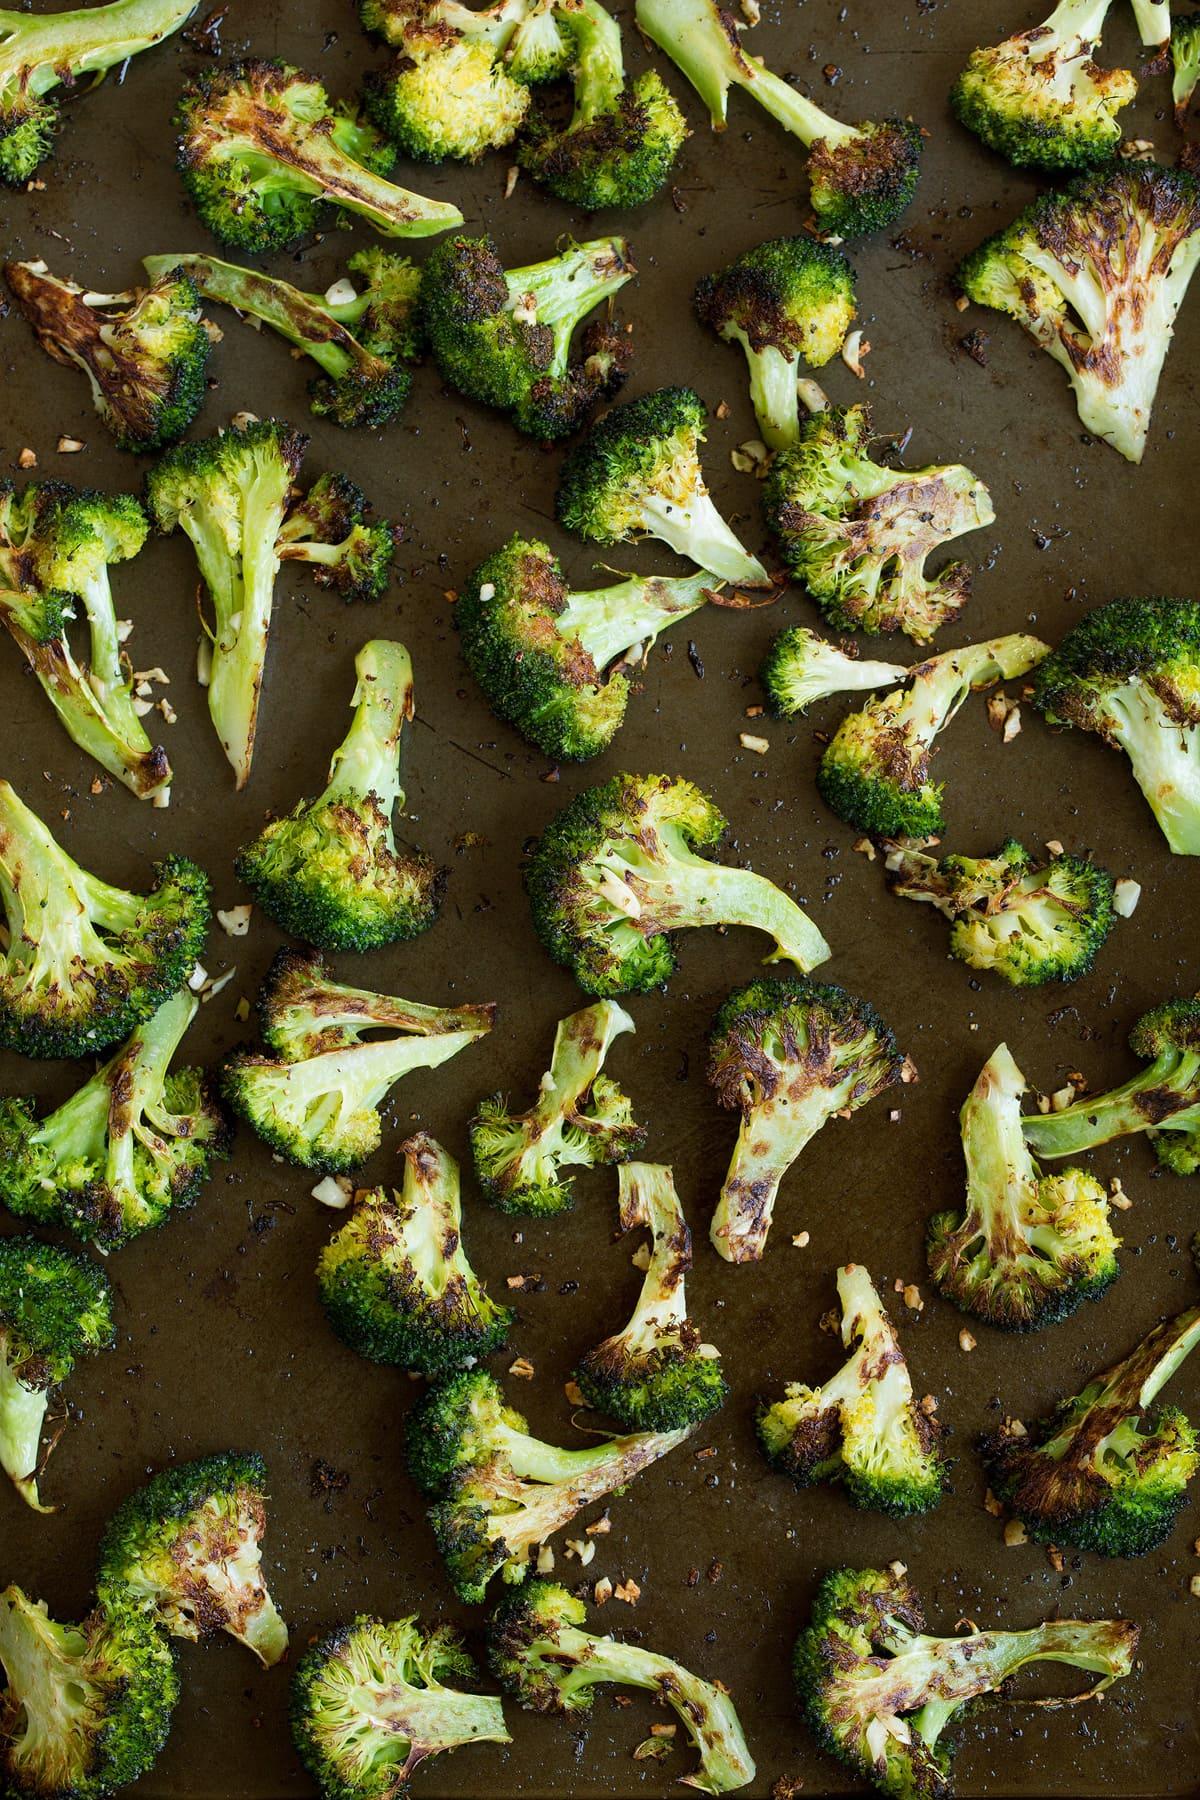 Roasted broccoli florets after baking.